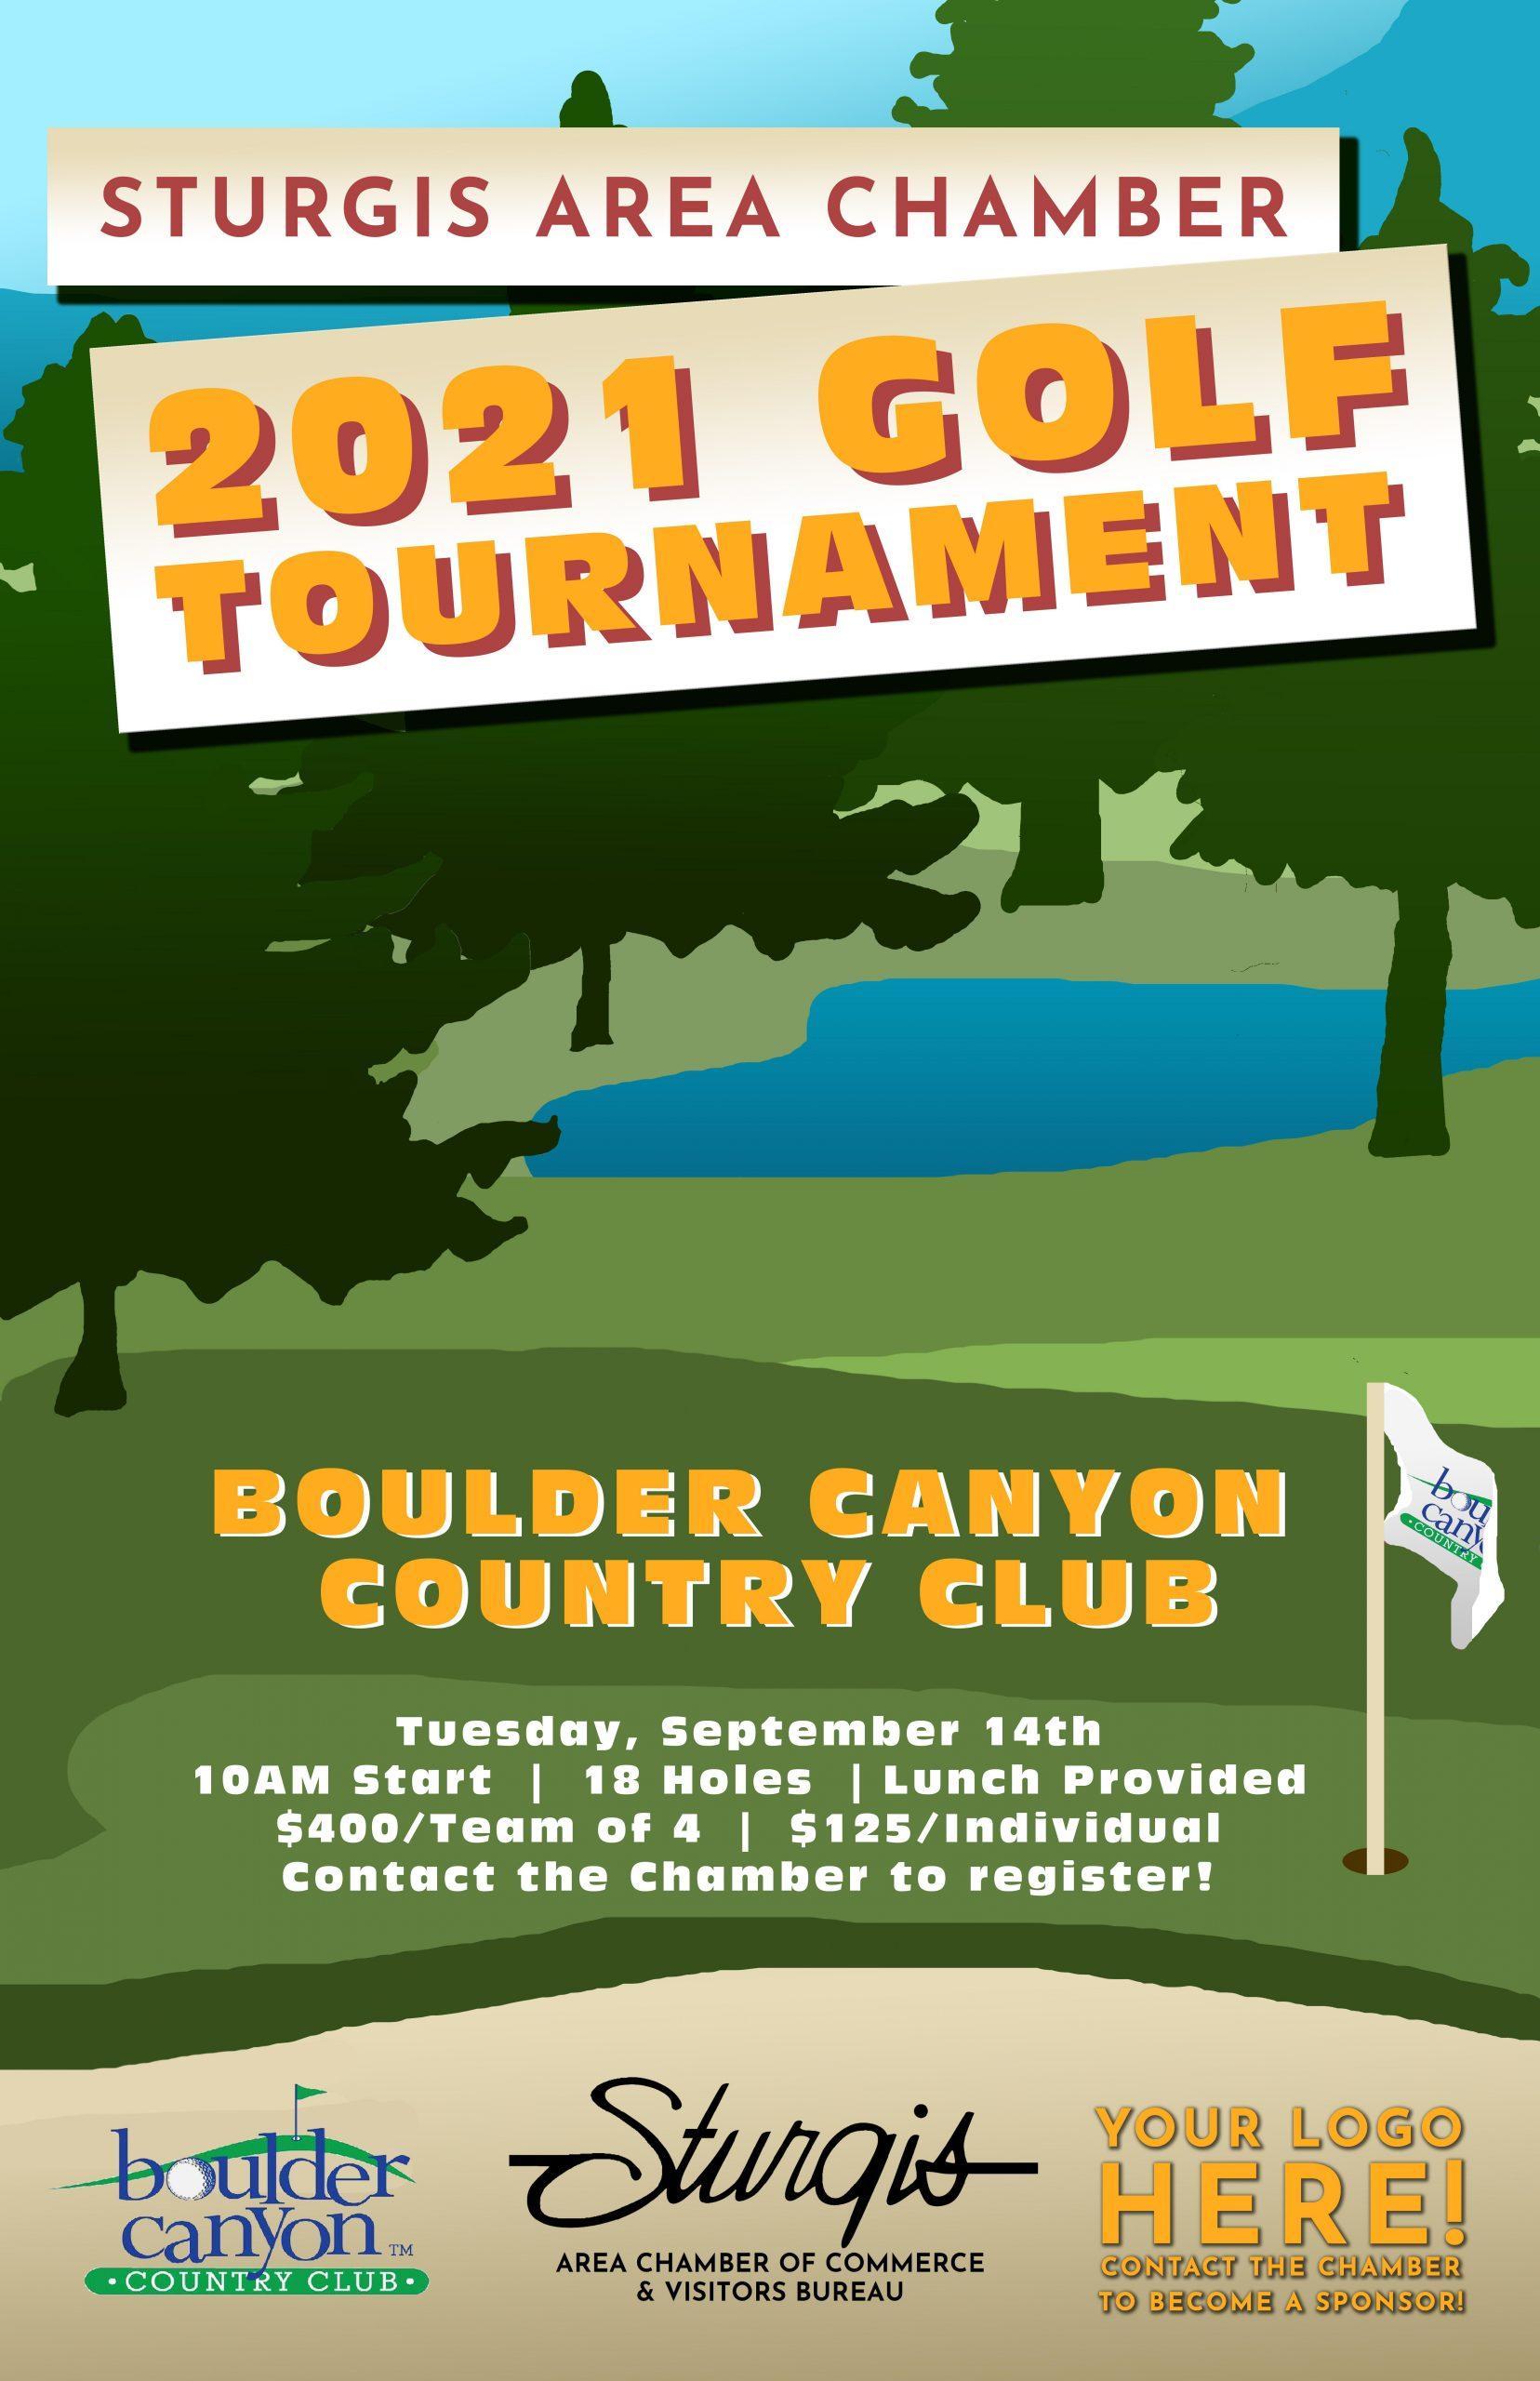 Sturgis Chamber 2021 Golf Tournament